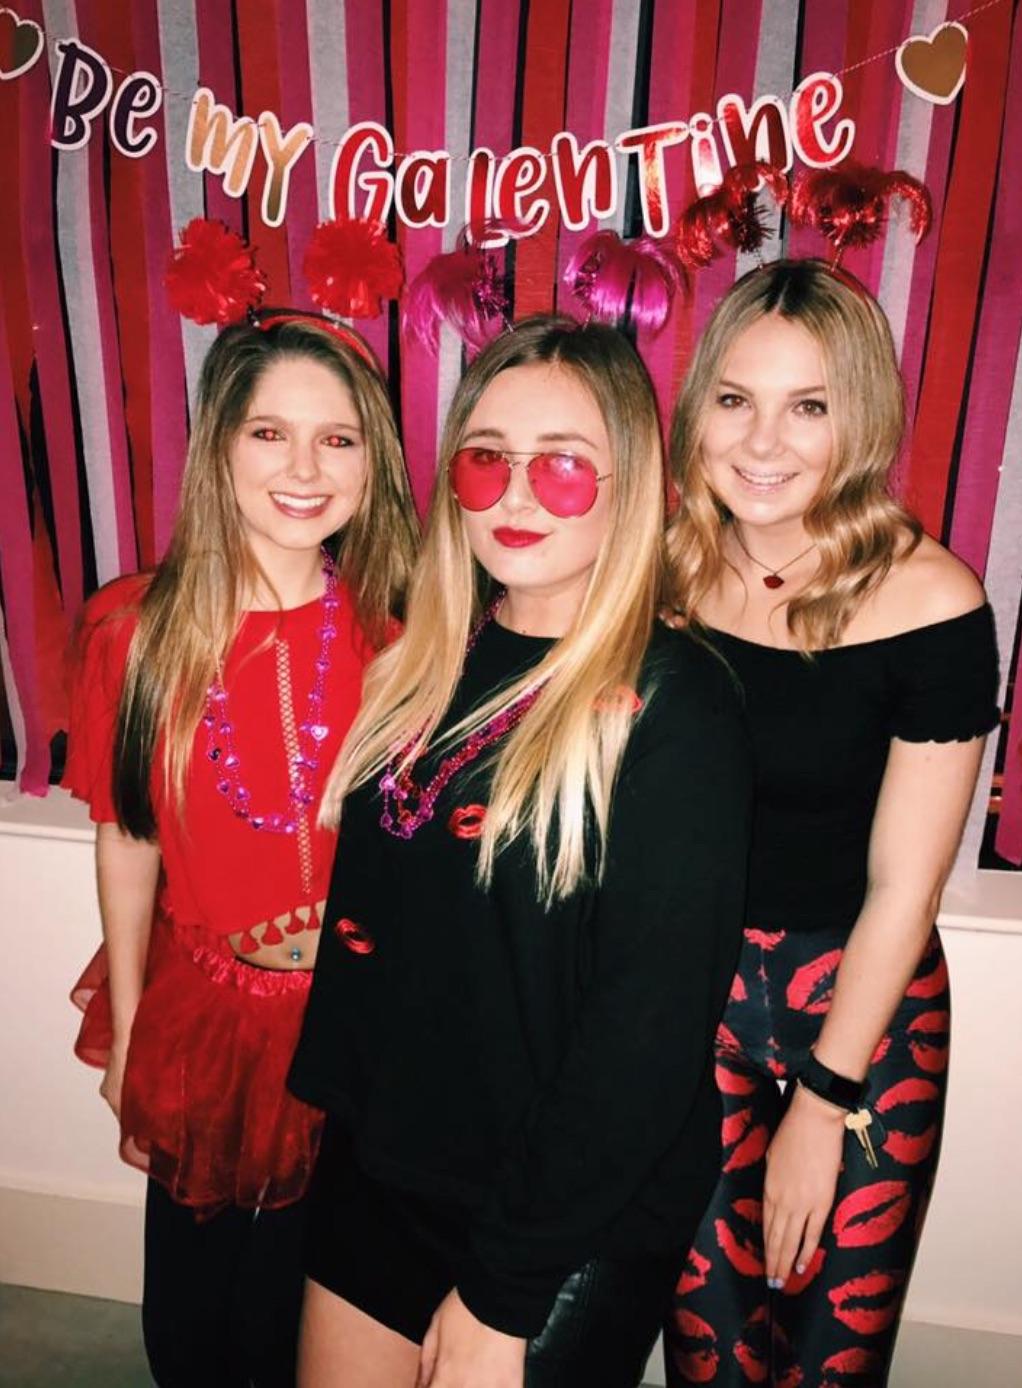 sisterhood21